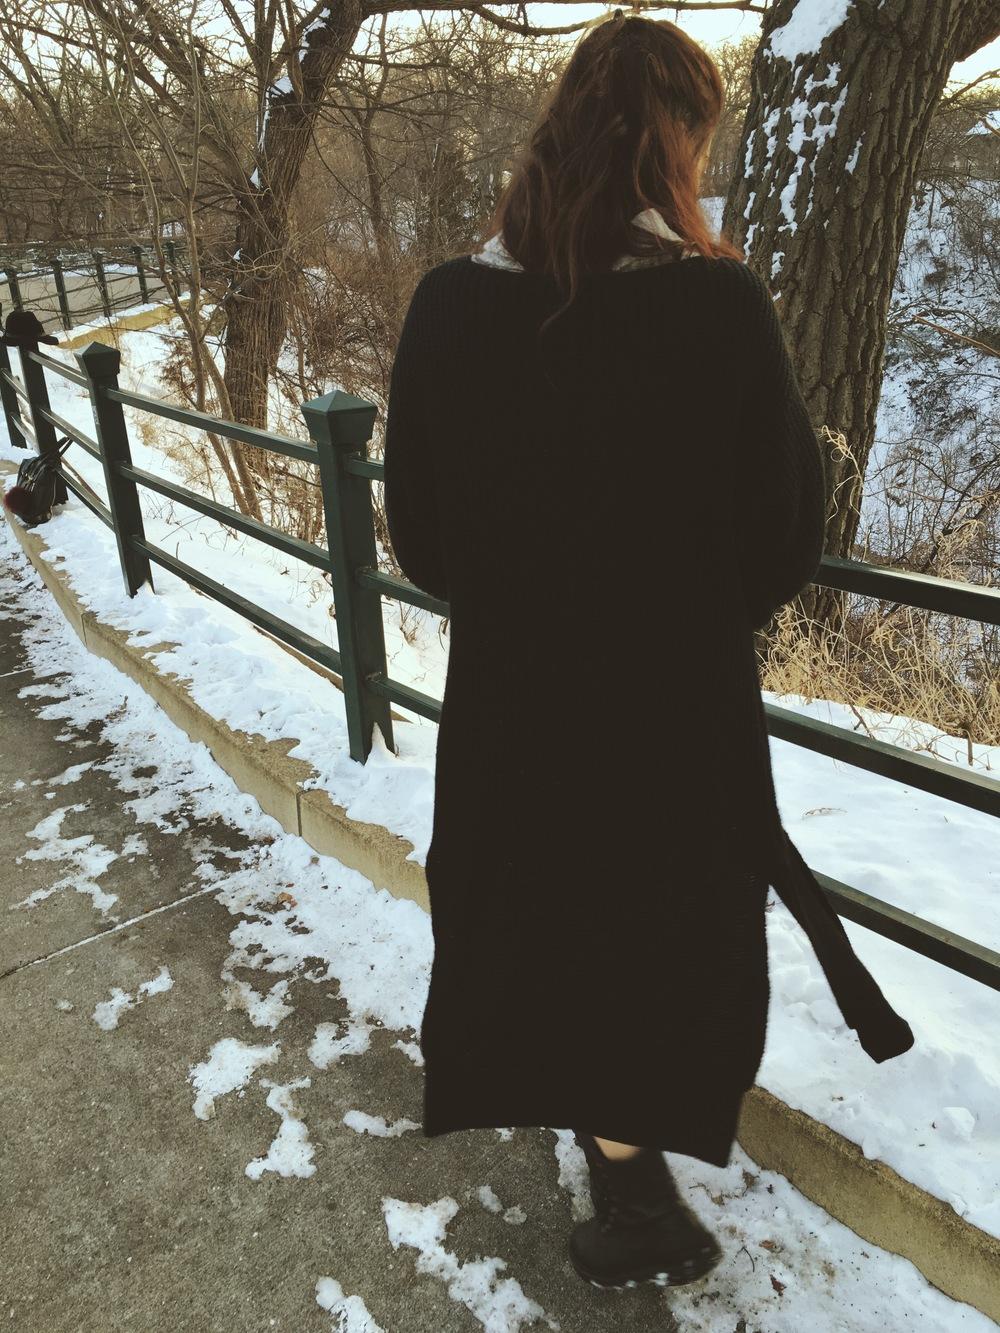 TaylorKnox_Waterfalls10